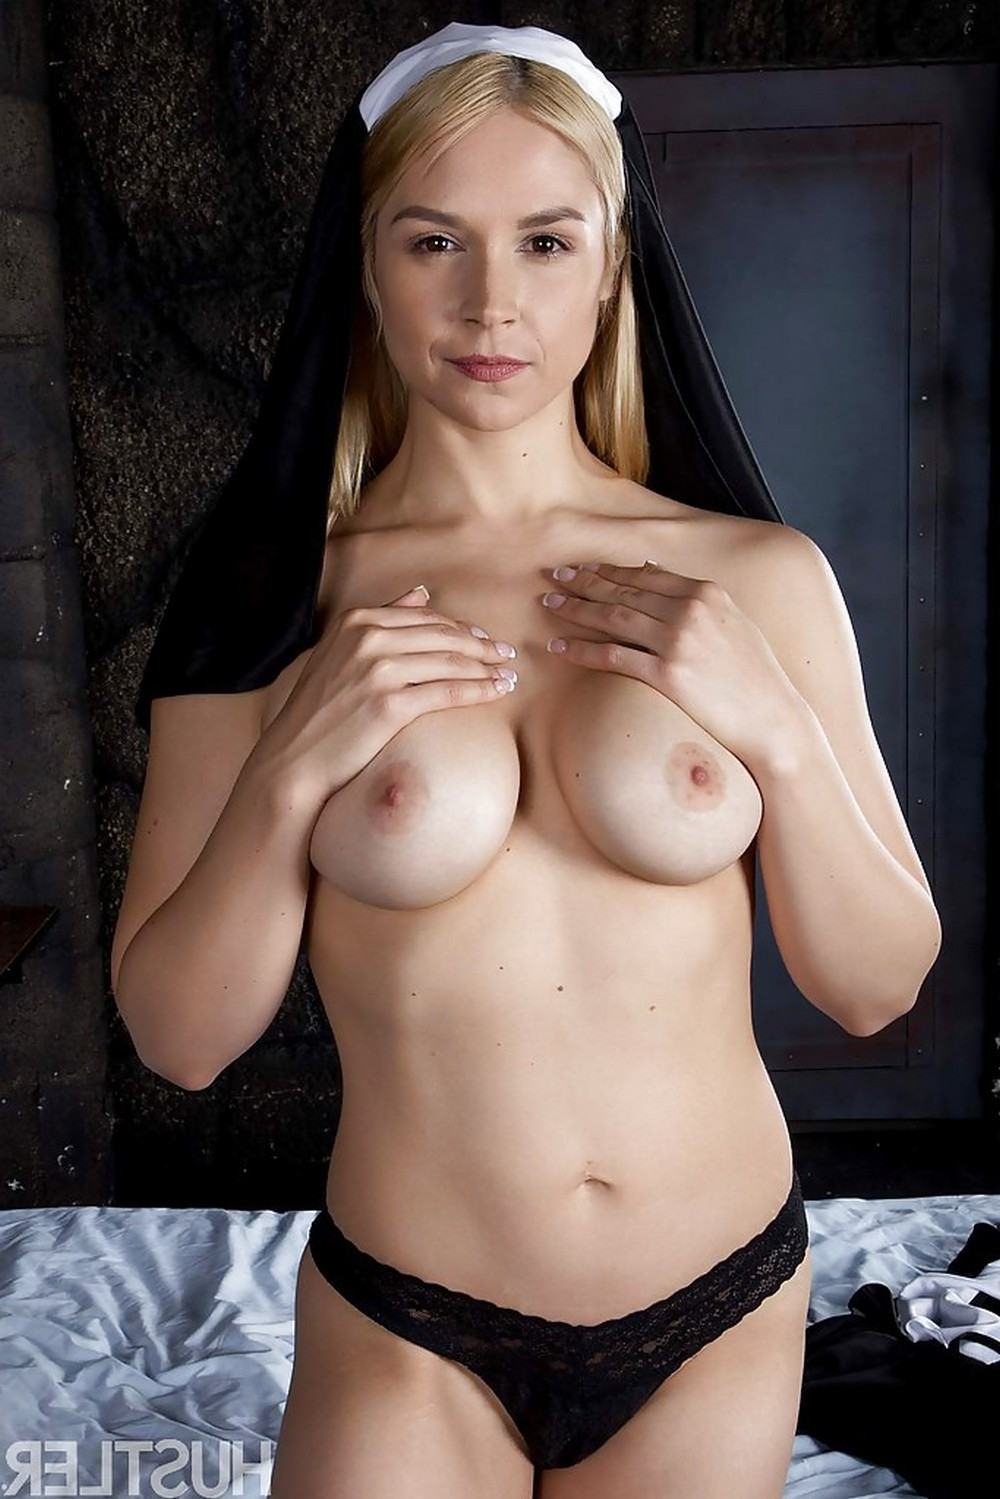 Развратная монашка Sara Sloane ублажает себя, мечтая о сексе